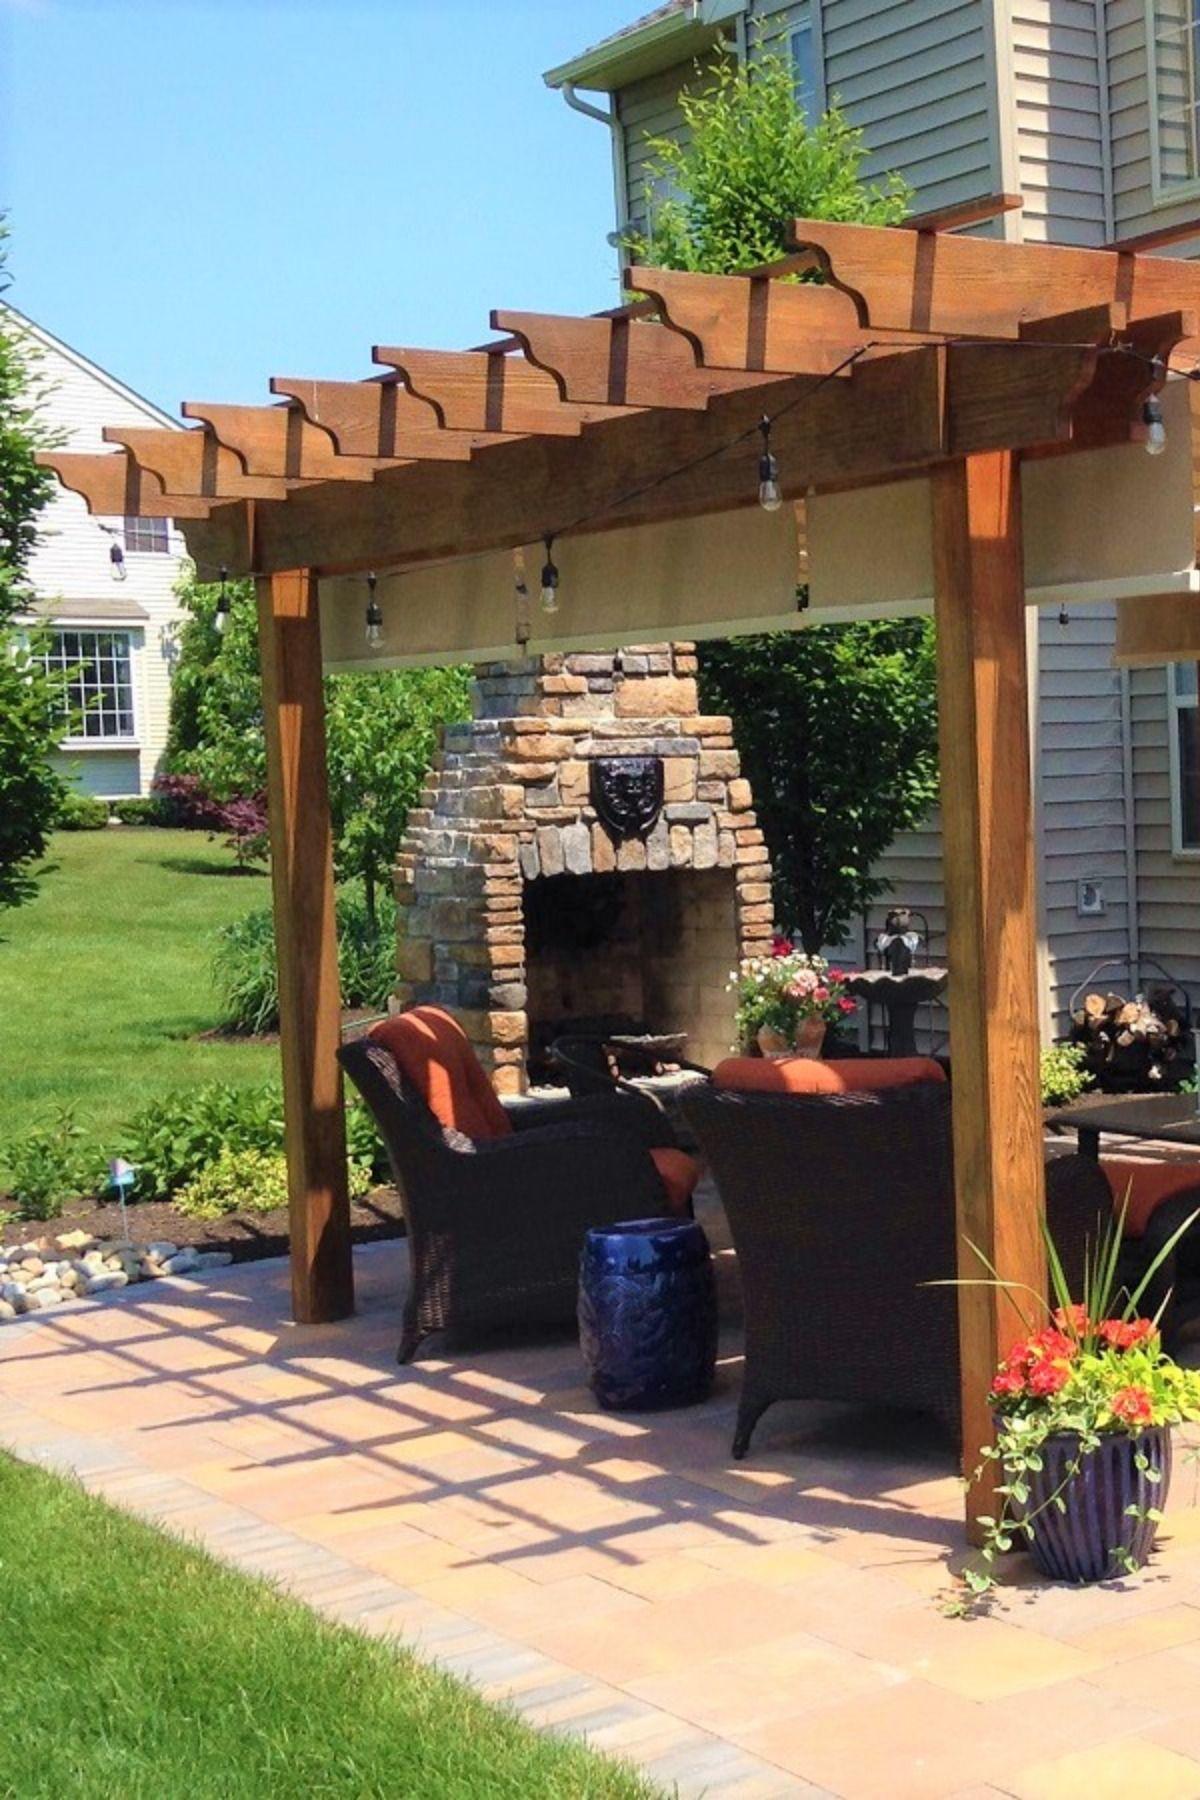 Backyard Pergola With Added Fabric Waterproof Awnings On Cables Pergola Shade Cover Backyard Pergola Pergola Shade